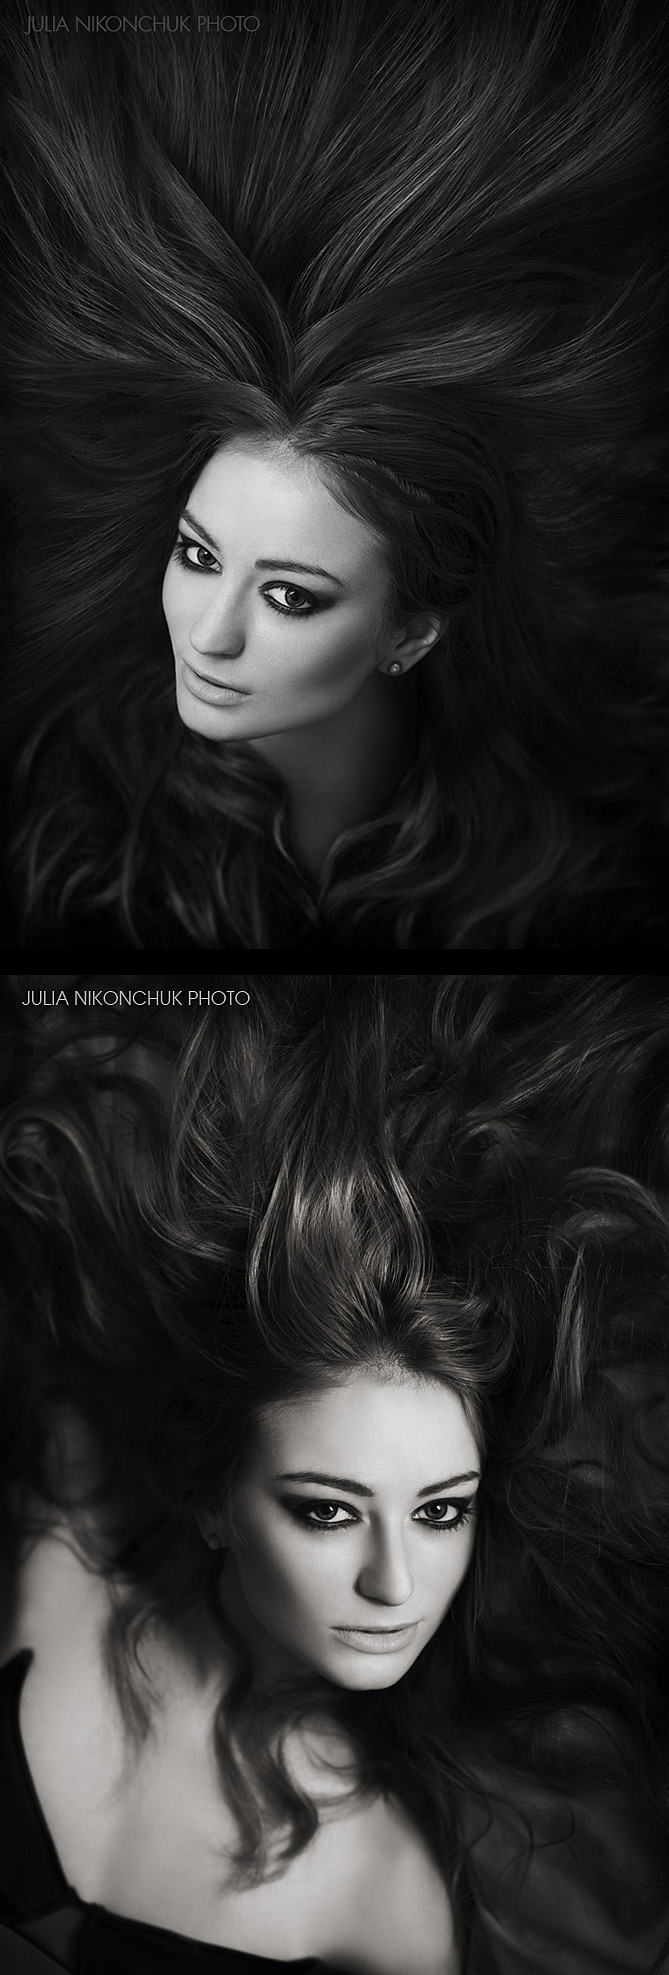 Female model photo shoot of Julia Nikonchuk